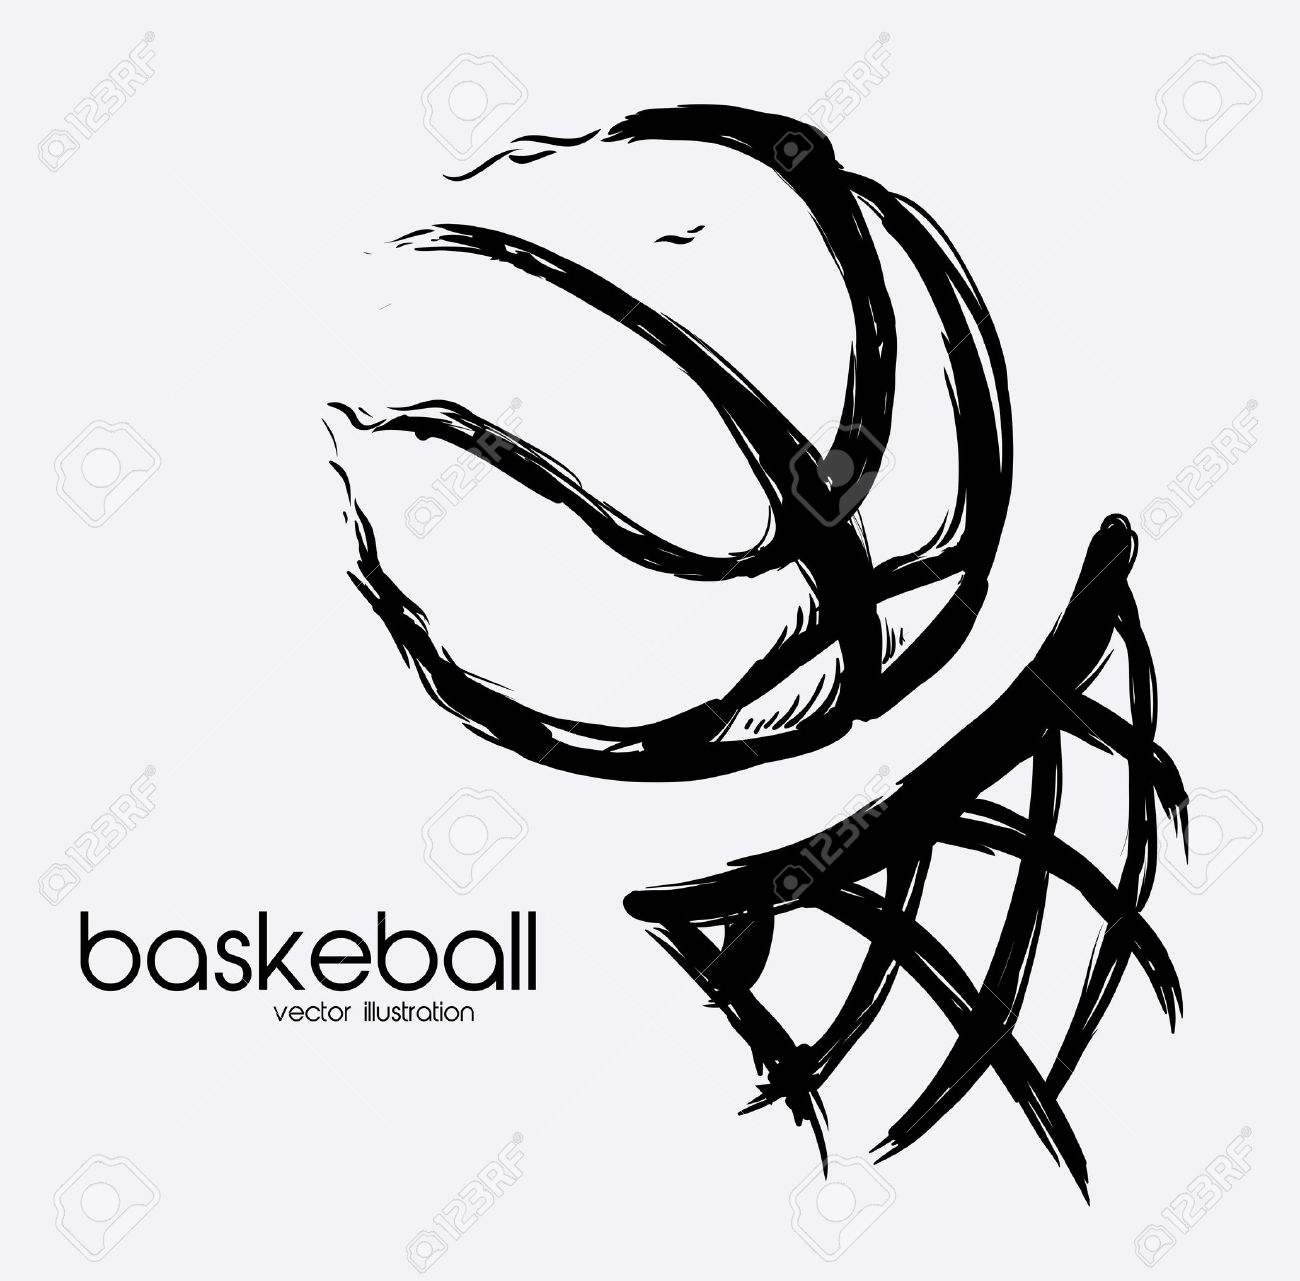 Poster design drawing - Vector Basketball Poster Design Vector Illustration